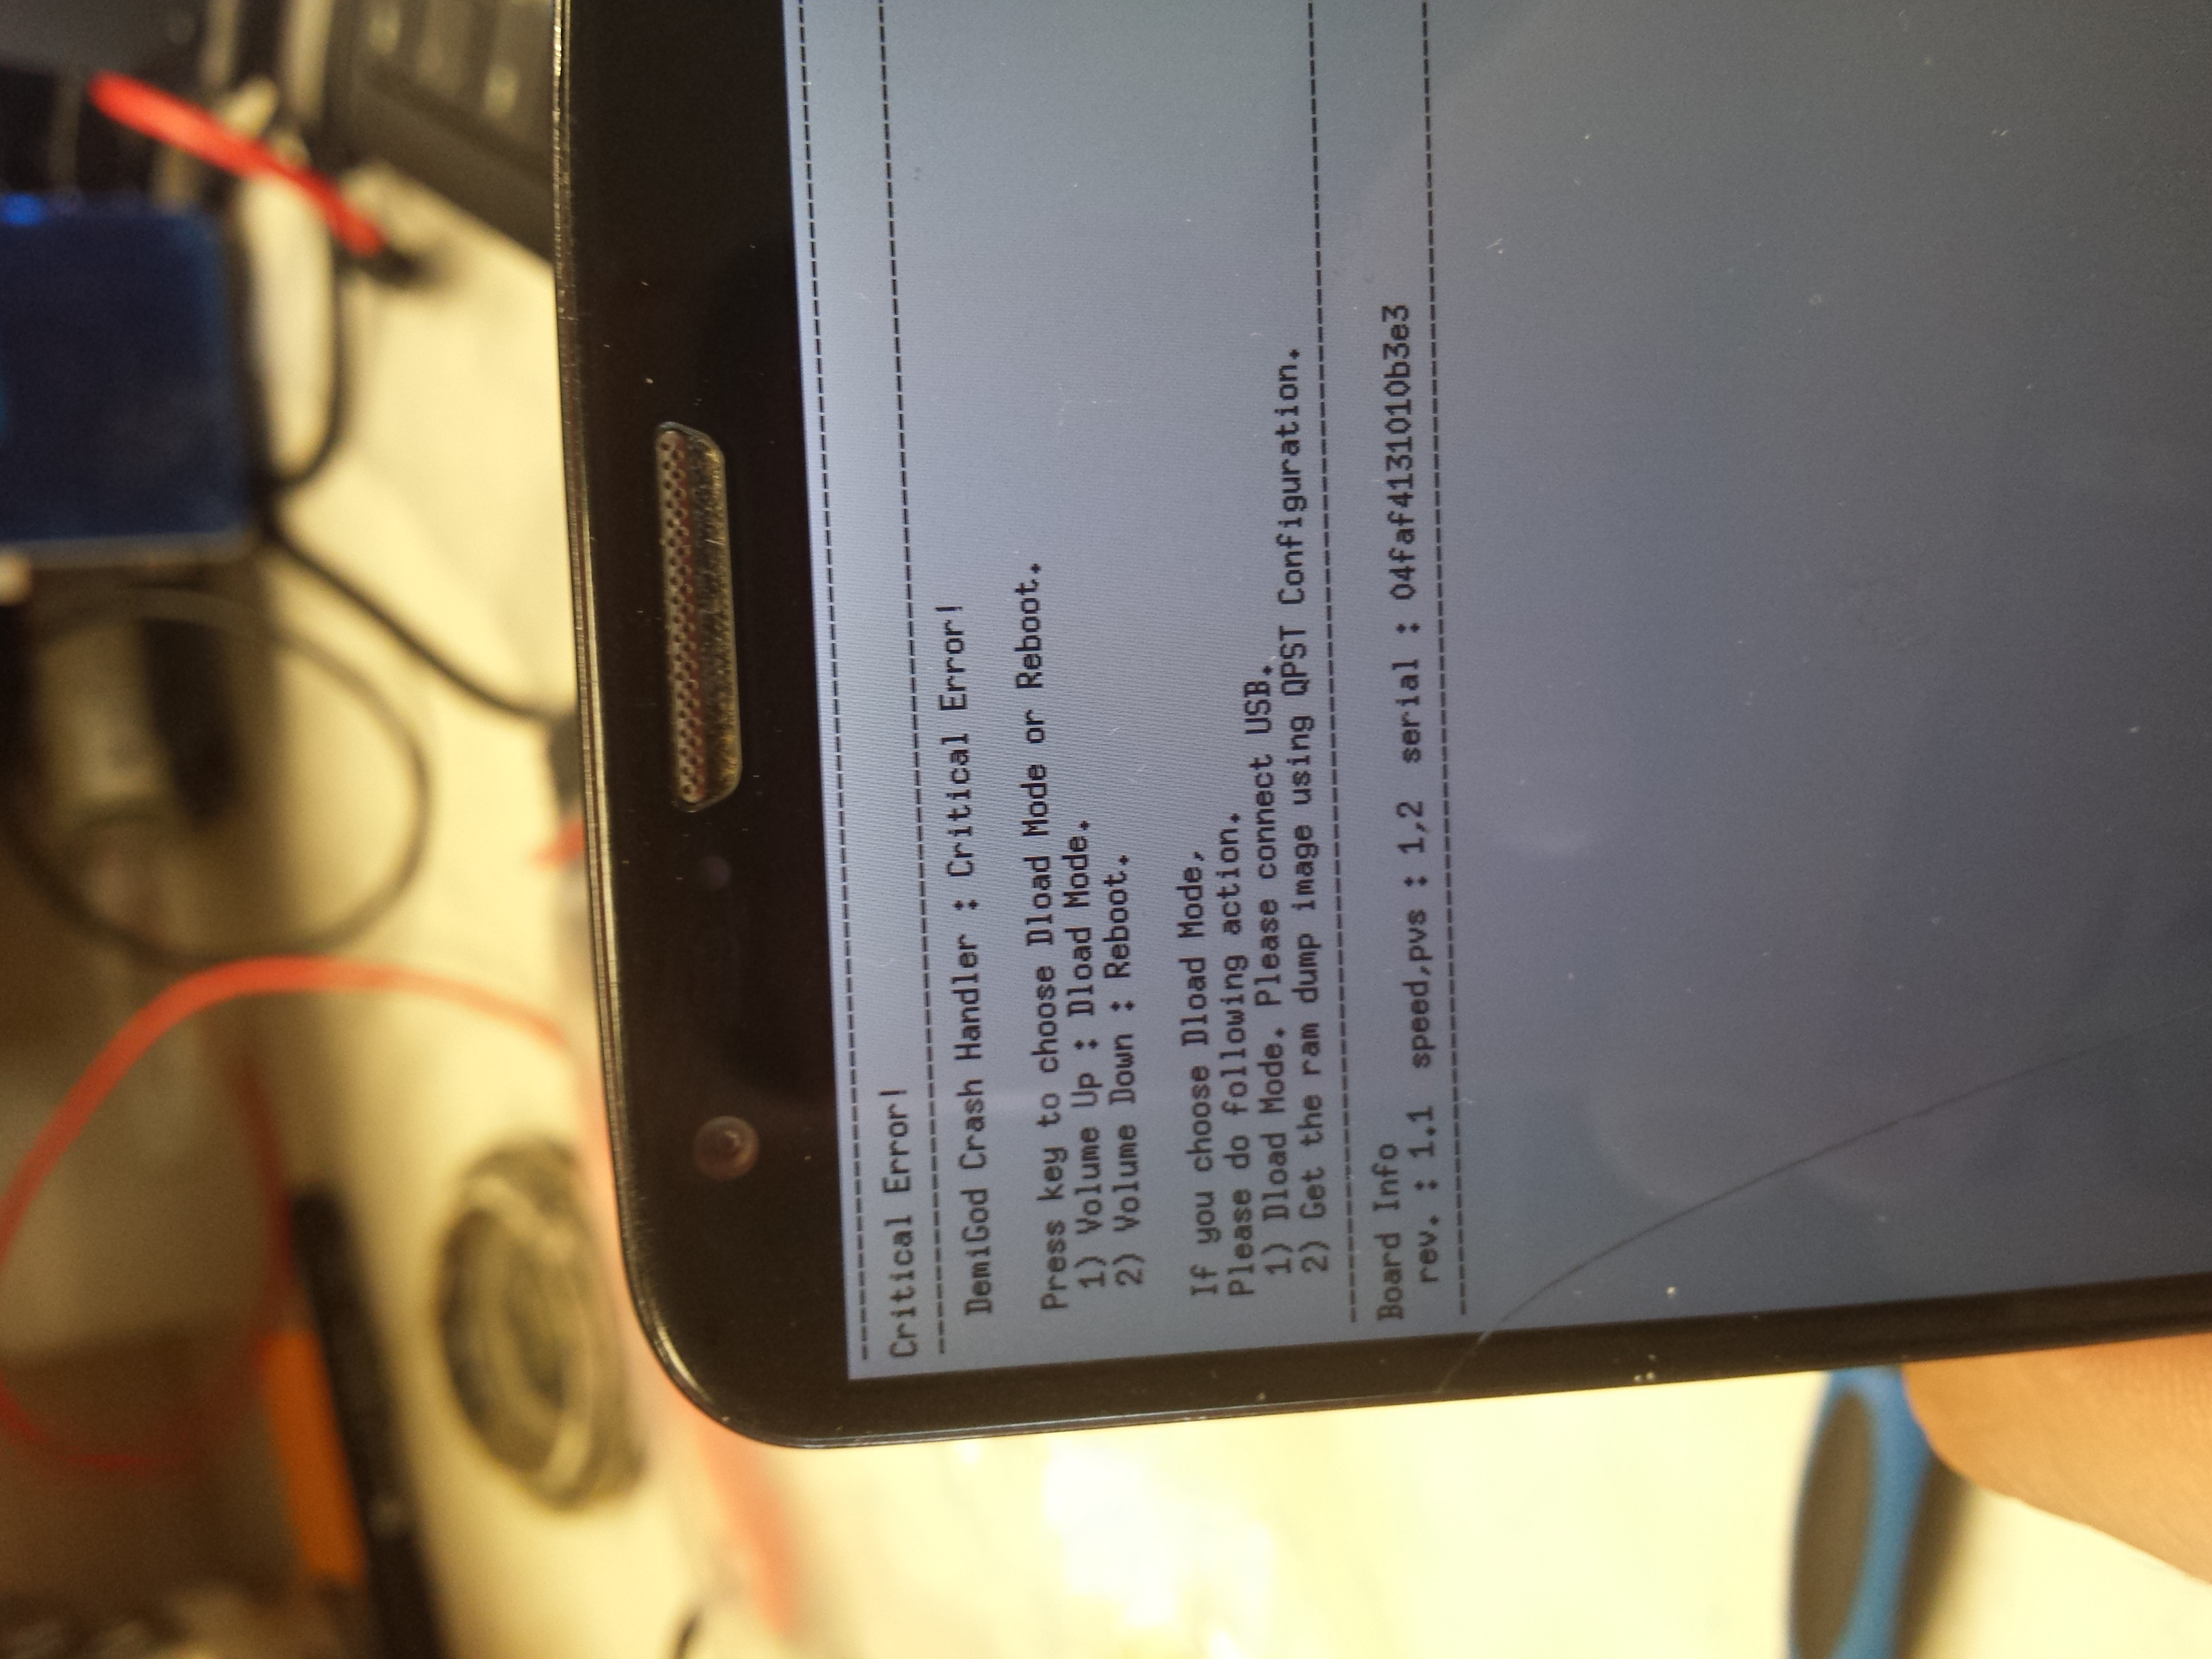 LG g2 - Critical Error - błąd aktualizacji - elektroda pl